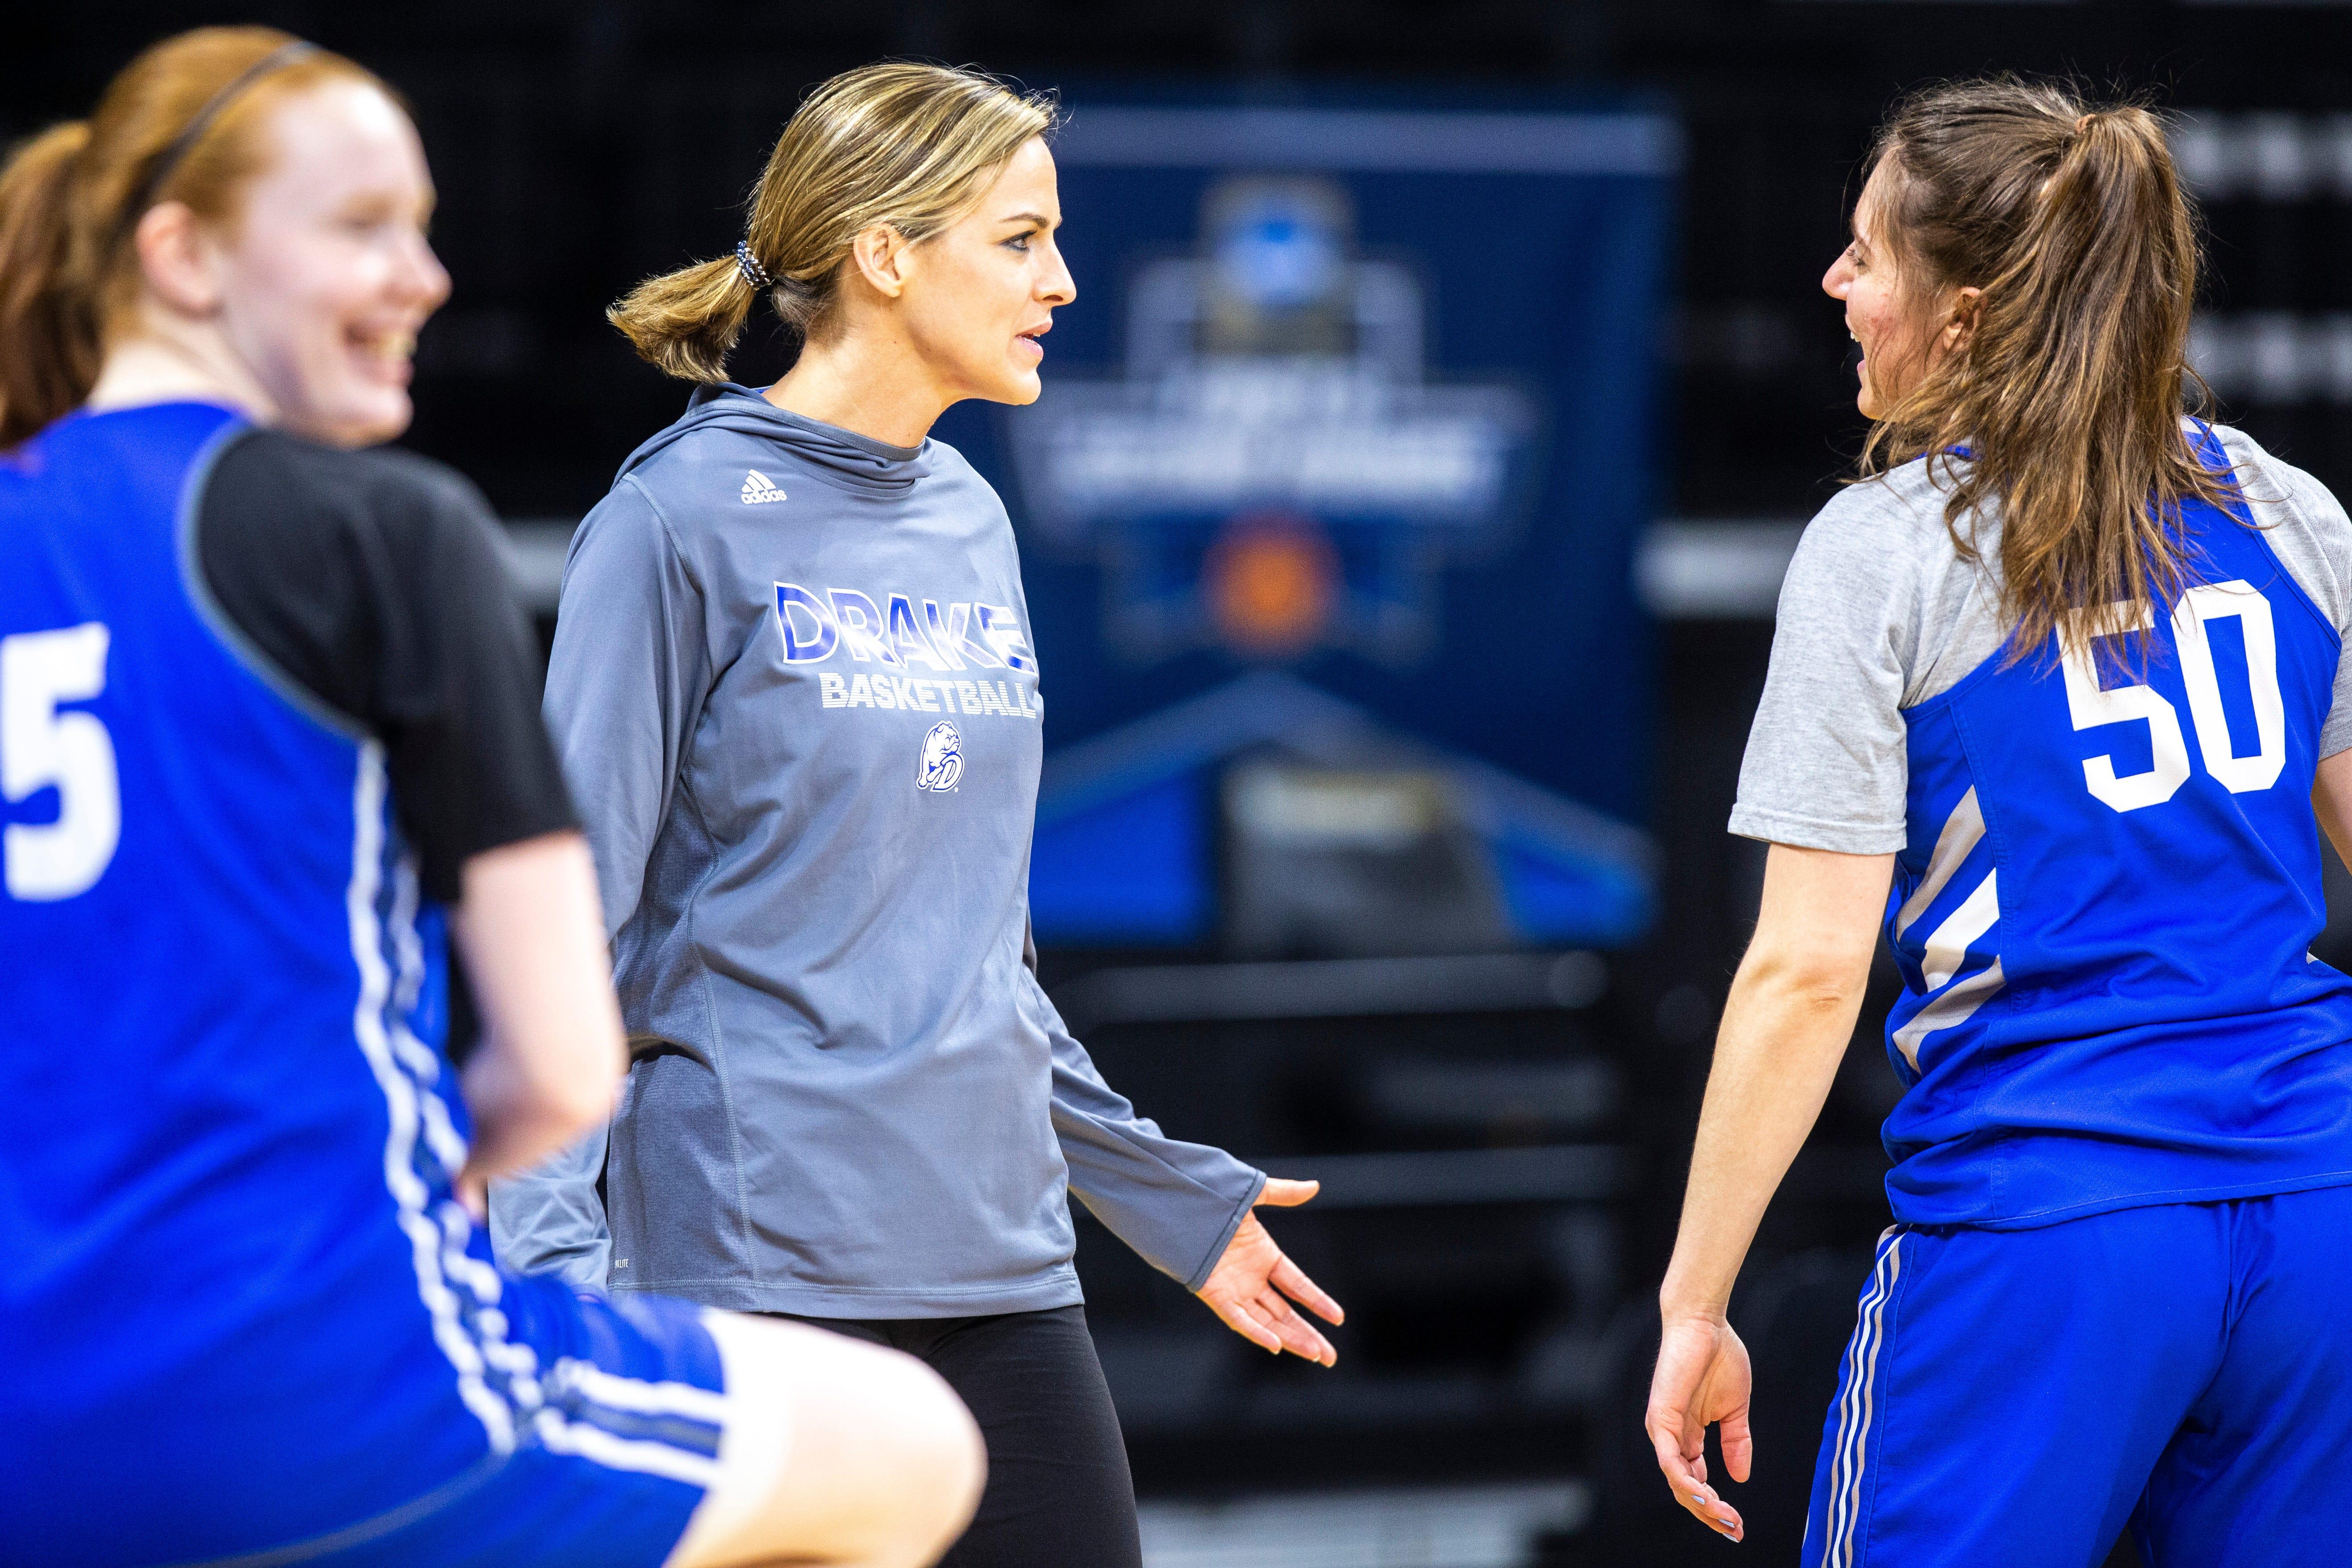 Photos: Drake Bulldogs women's basketball first-round practice day in Iowa City